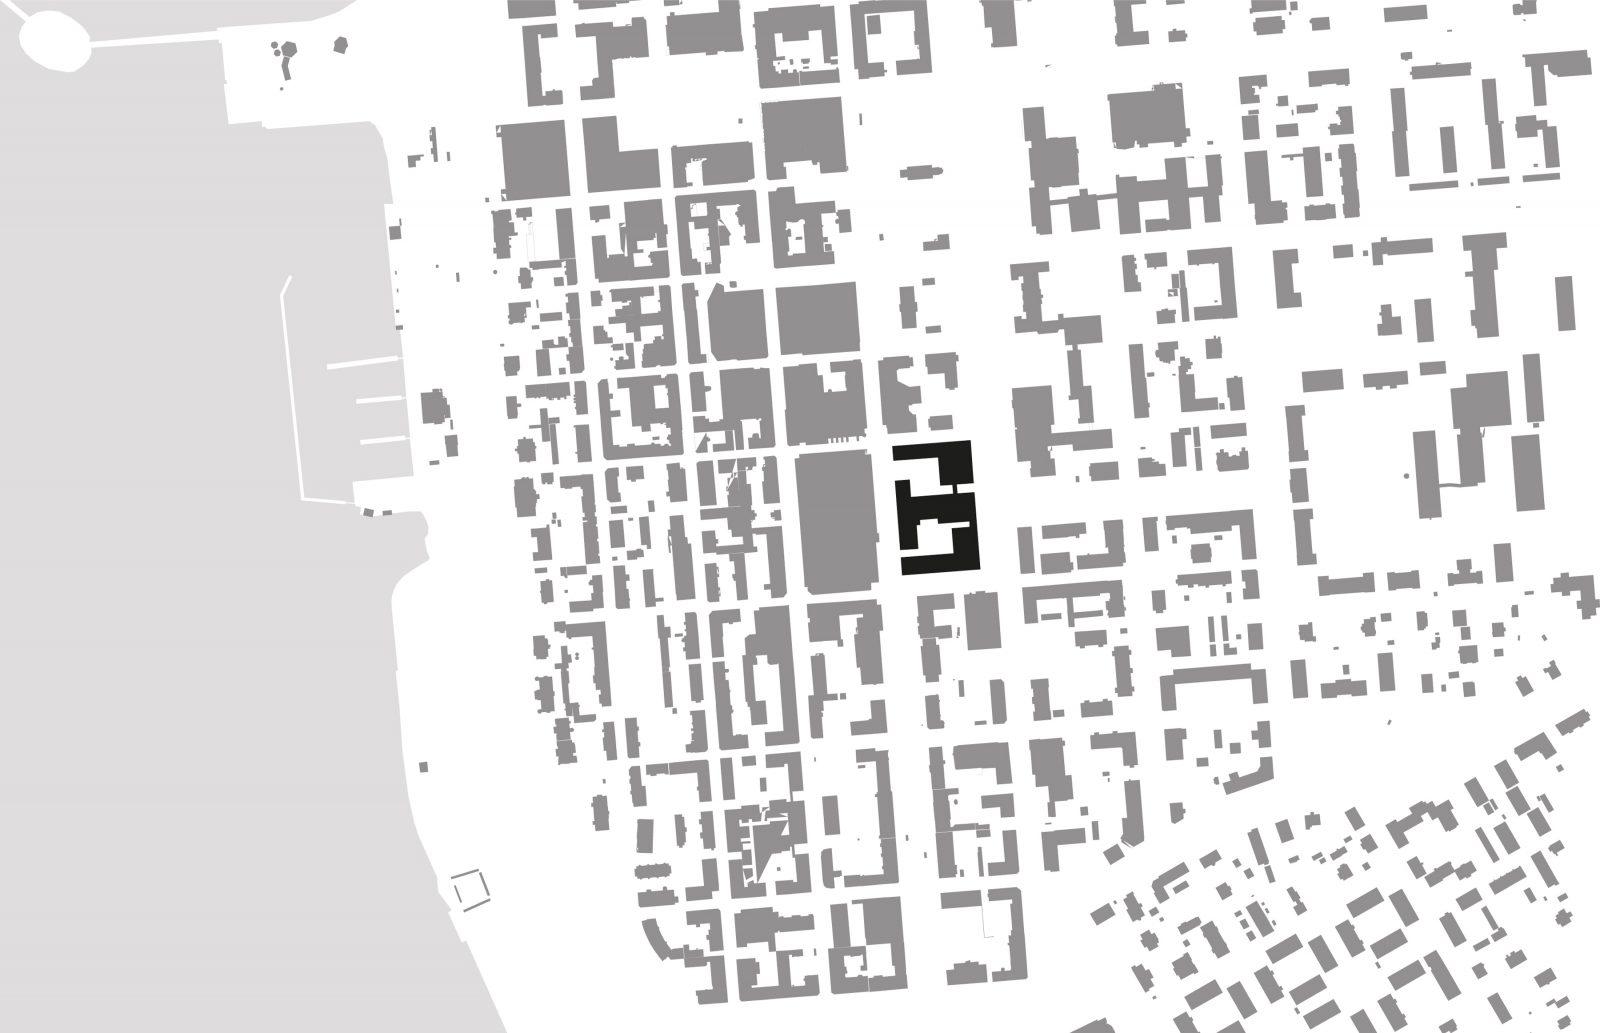 KjellanderSjöberg Kulturkvarter sitplan 3600x2324px